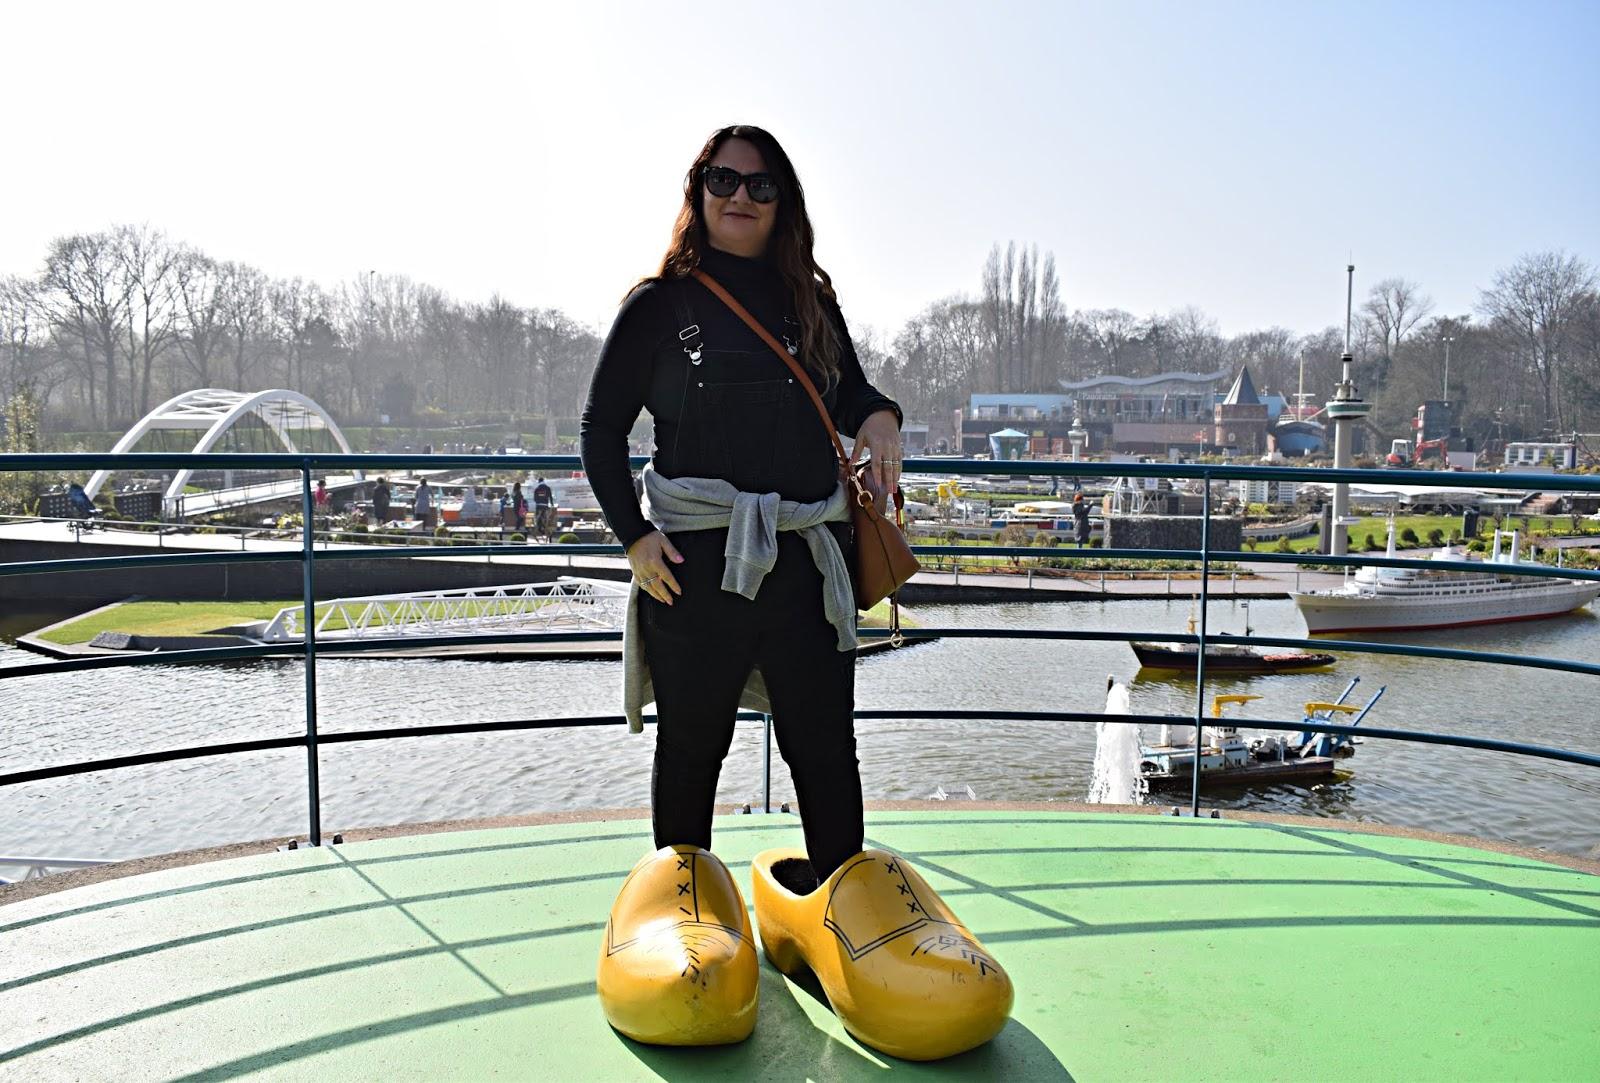 Madurodam & Den Haag day trip from Amsterdam